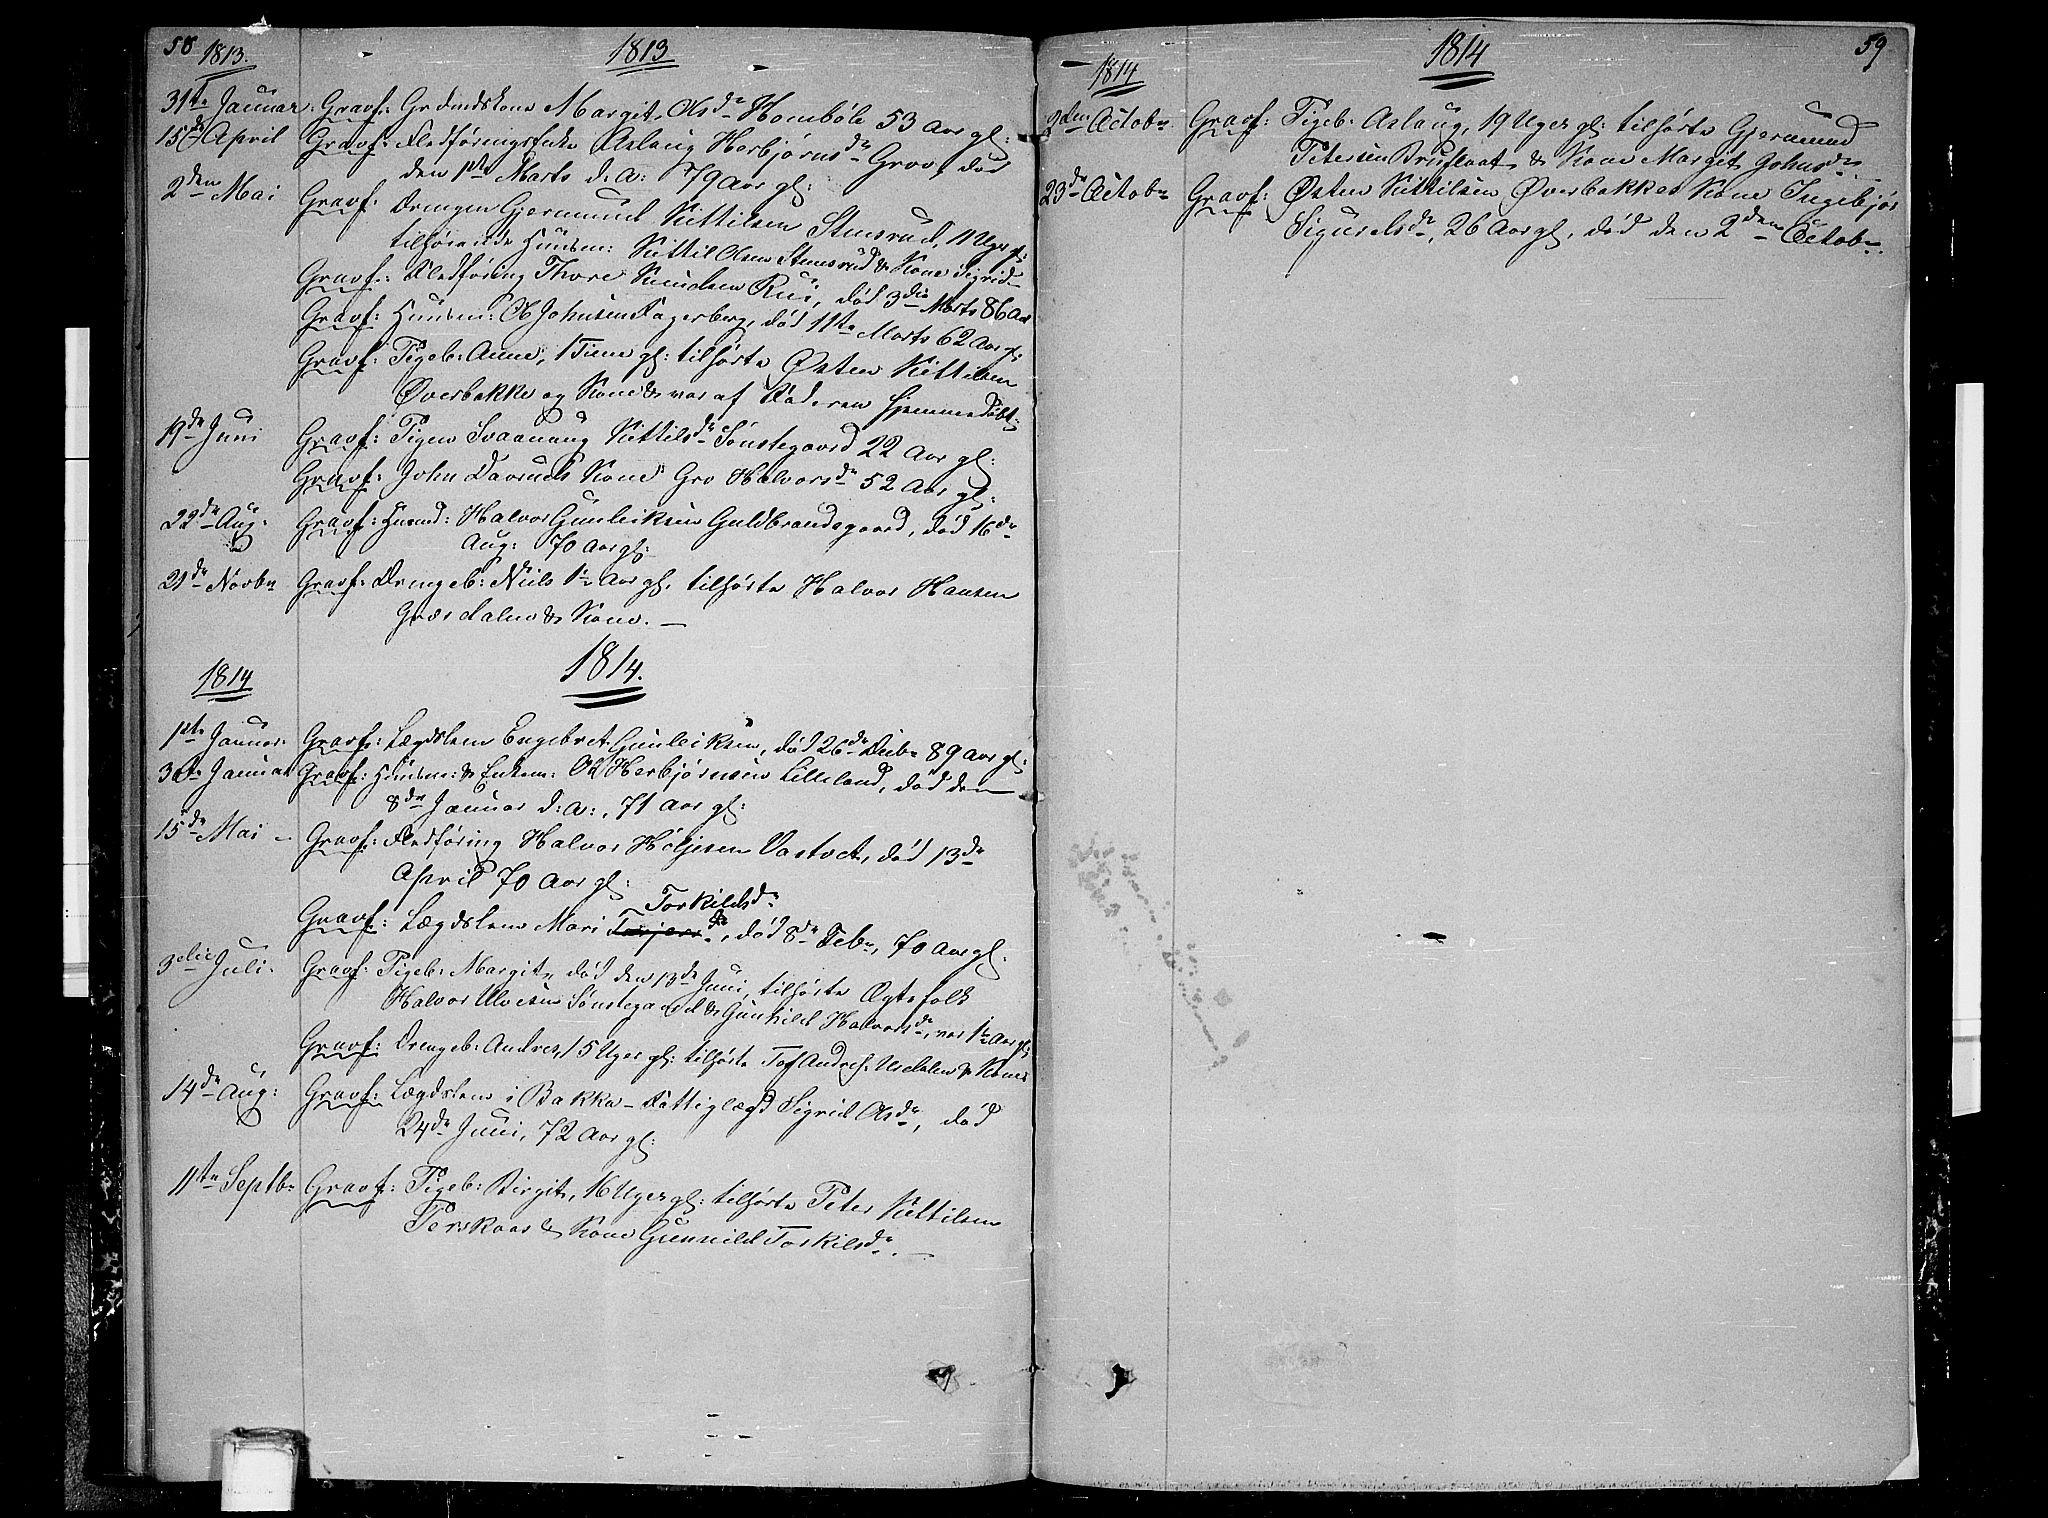 SAKO, Gransherad kirkebøker, F/Fb/L0001: Ministerialbok nr. II 1, 1800-1814, s. 58-59